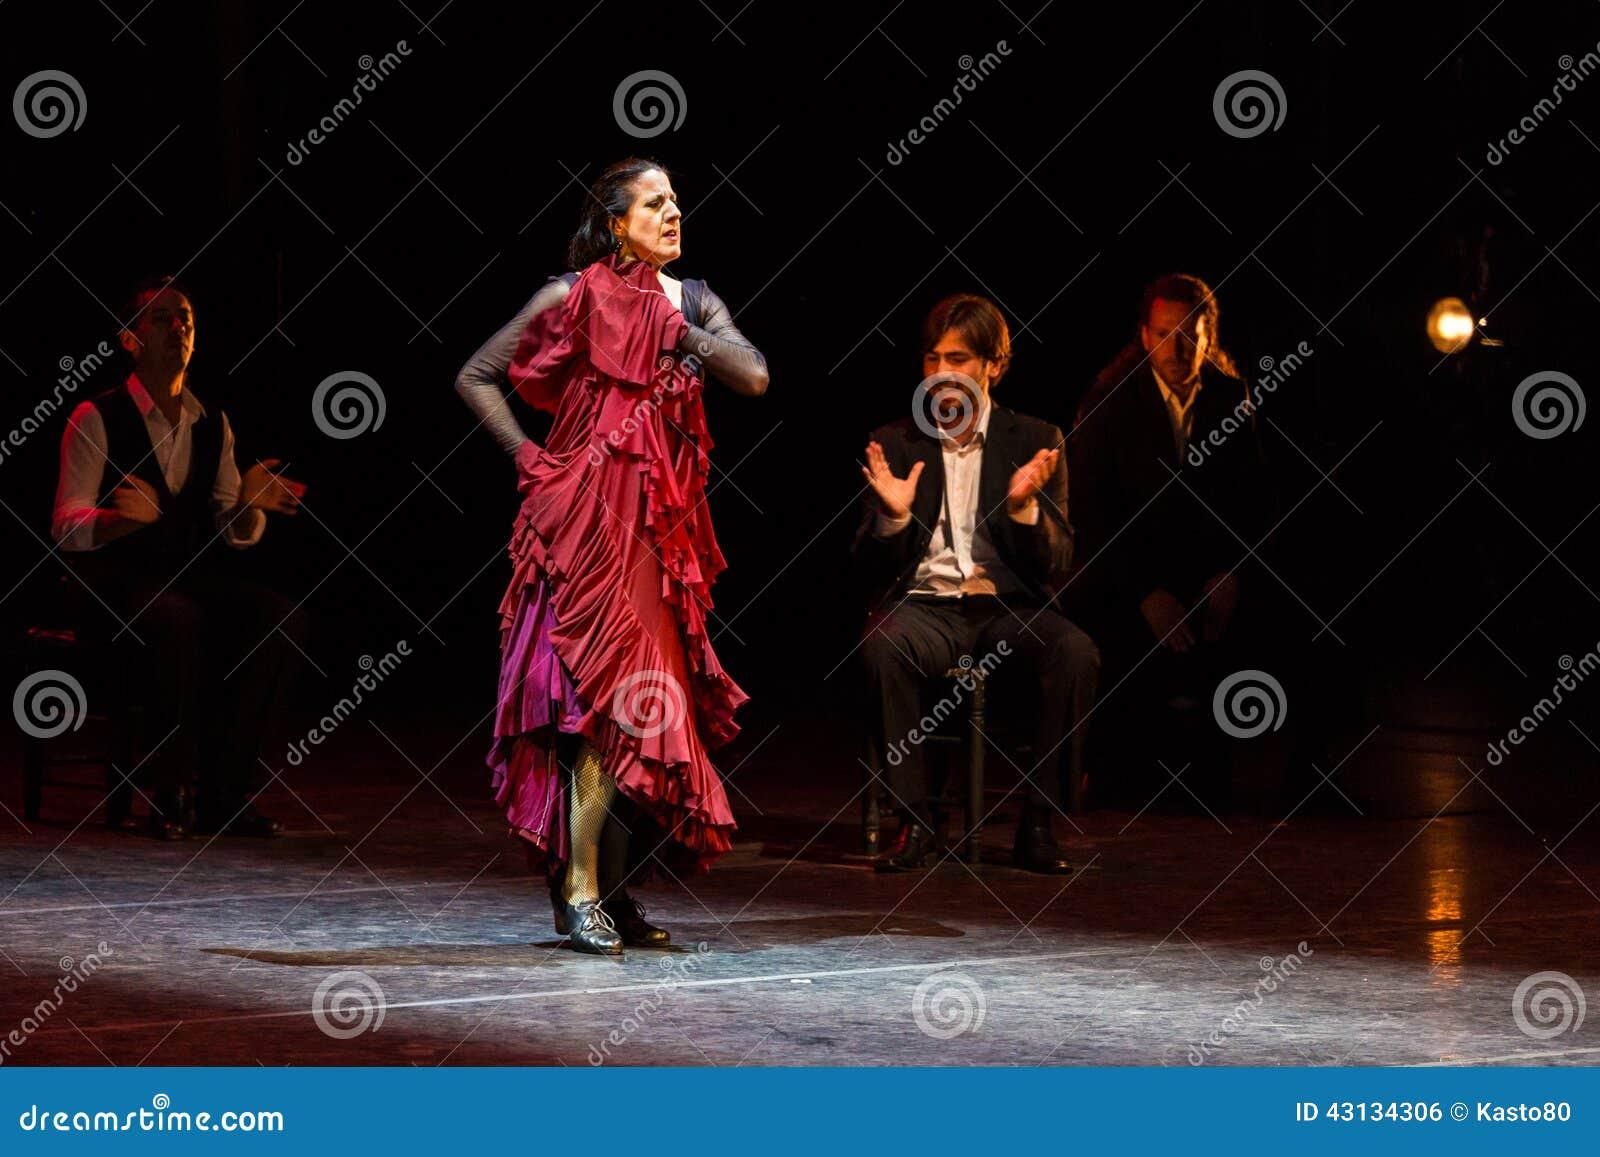 maria pages spanish flamenco dancer editorial photo image